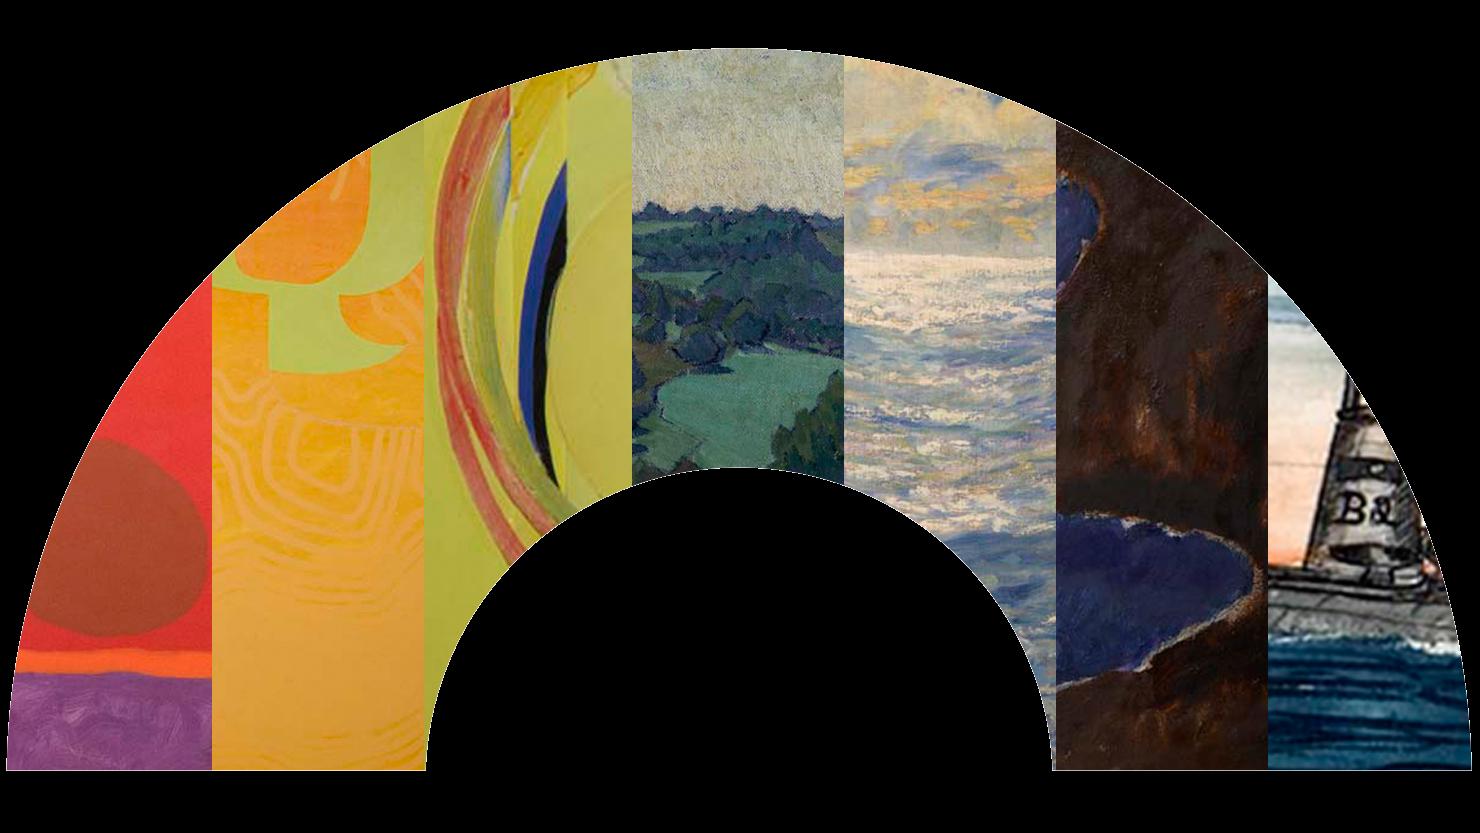 Culture in Quarantine, 30 April 2020: A Rainbow of Art